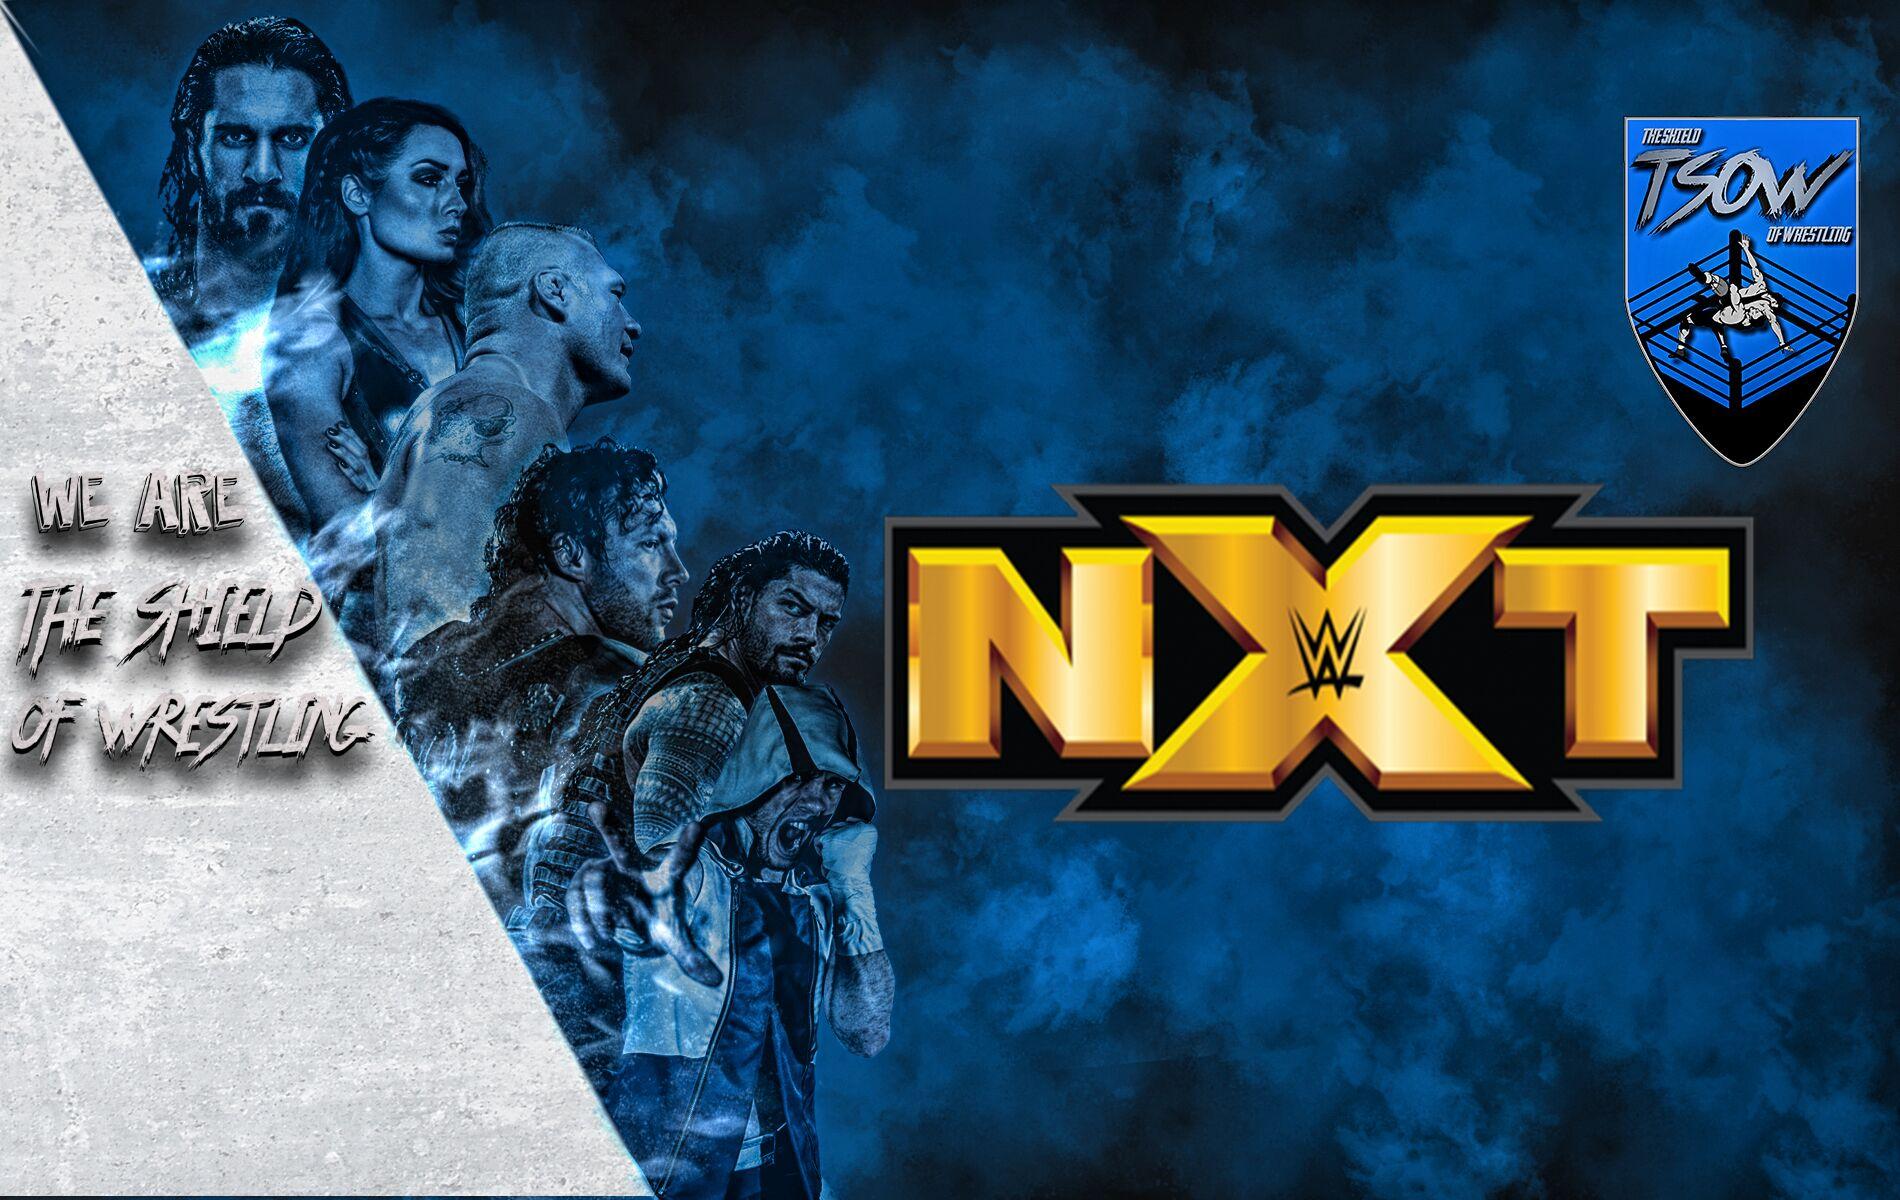 NXT 18 -USA Network